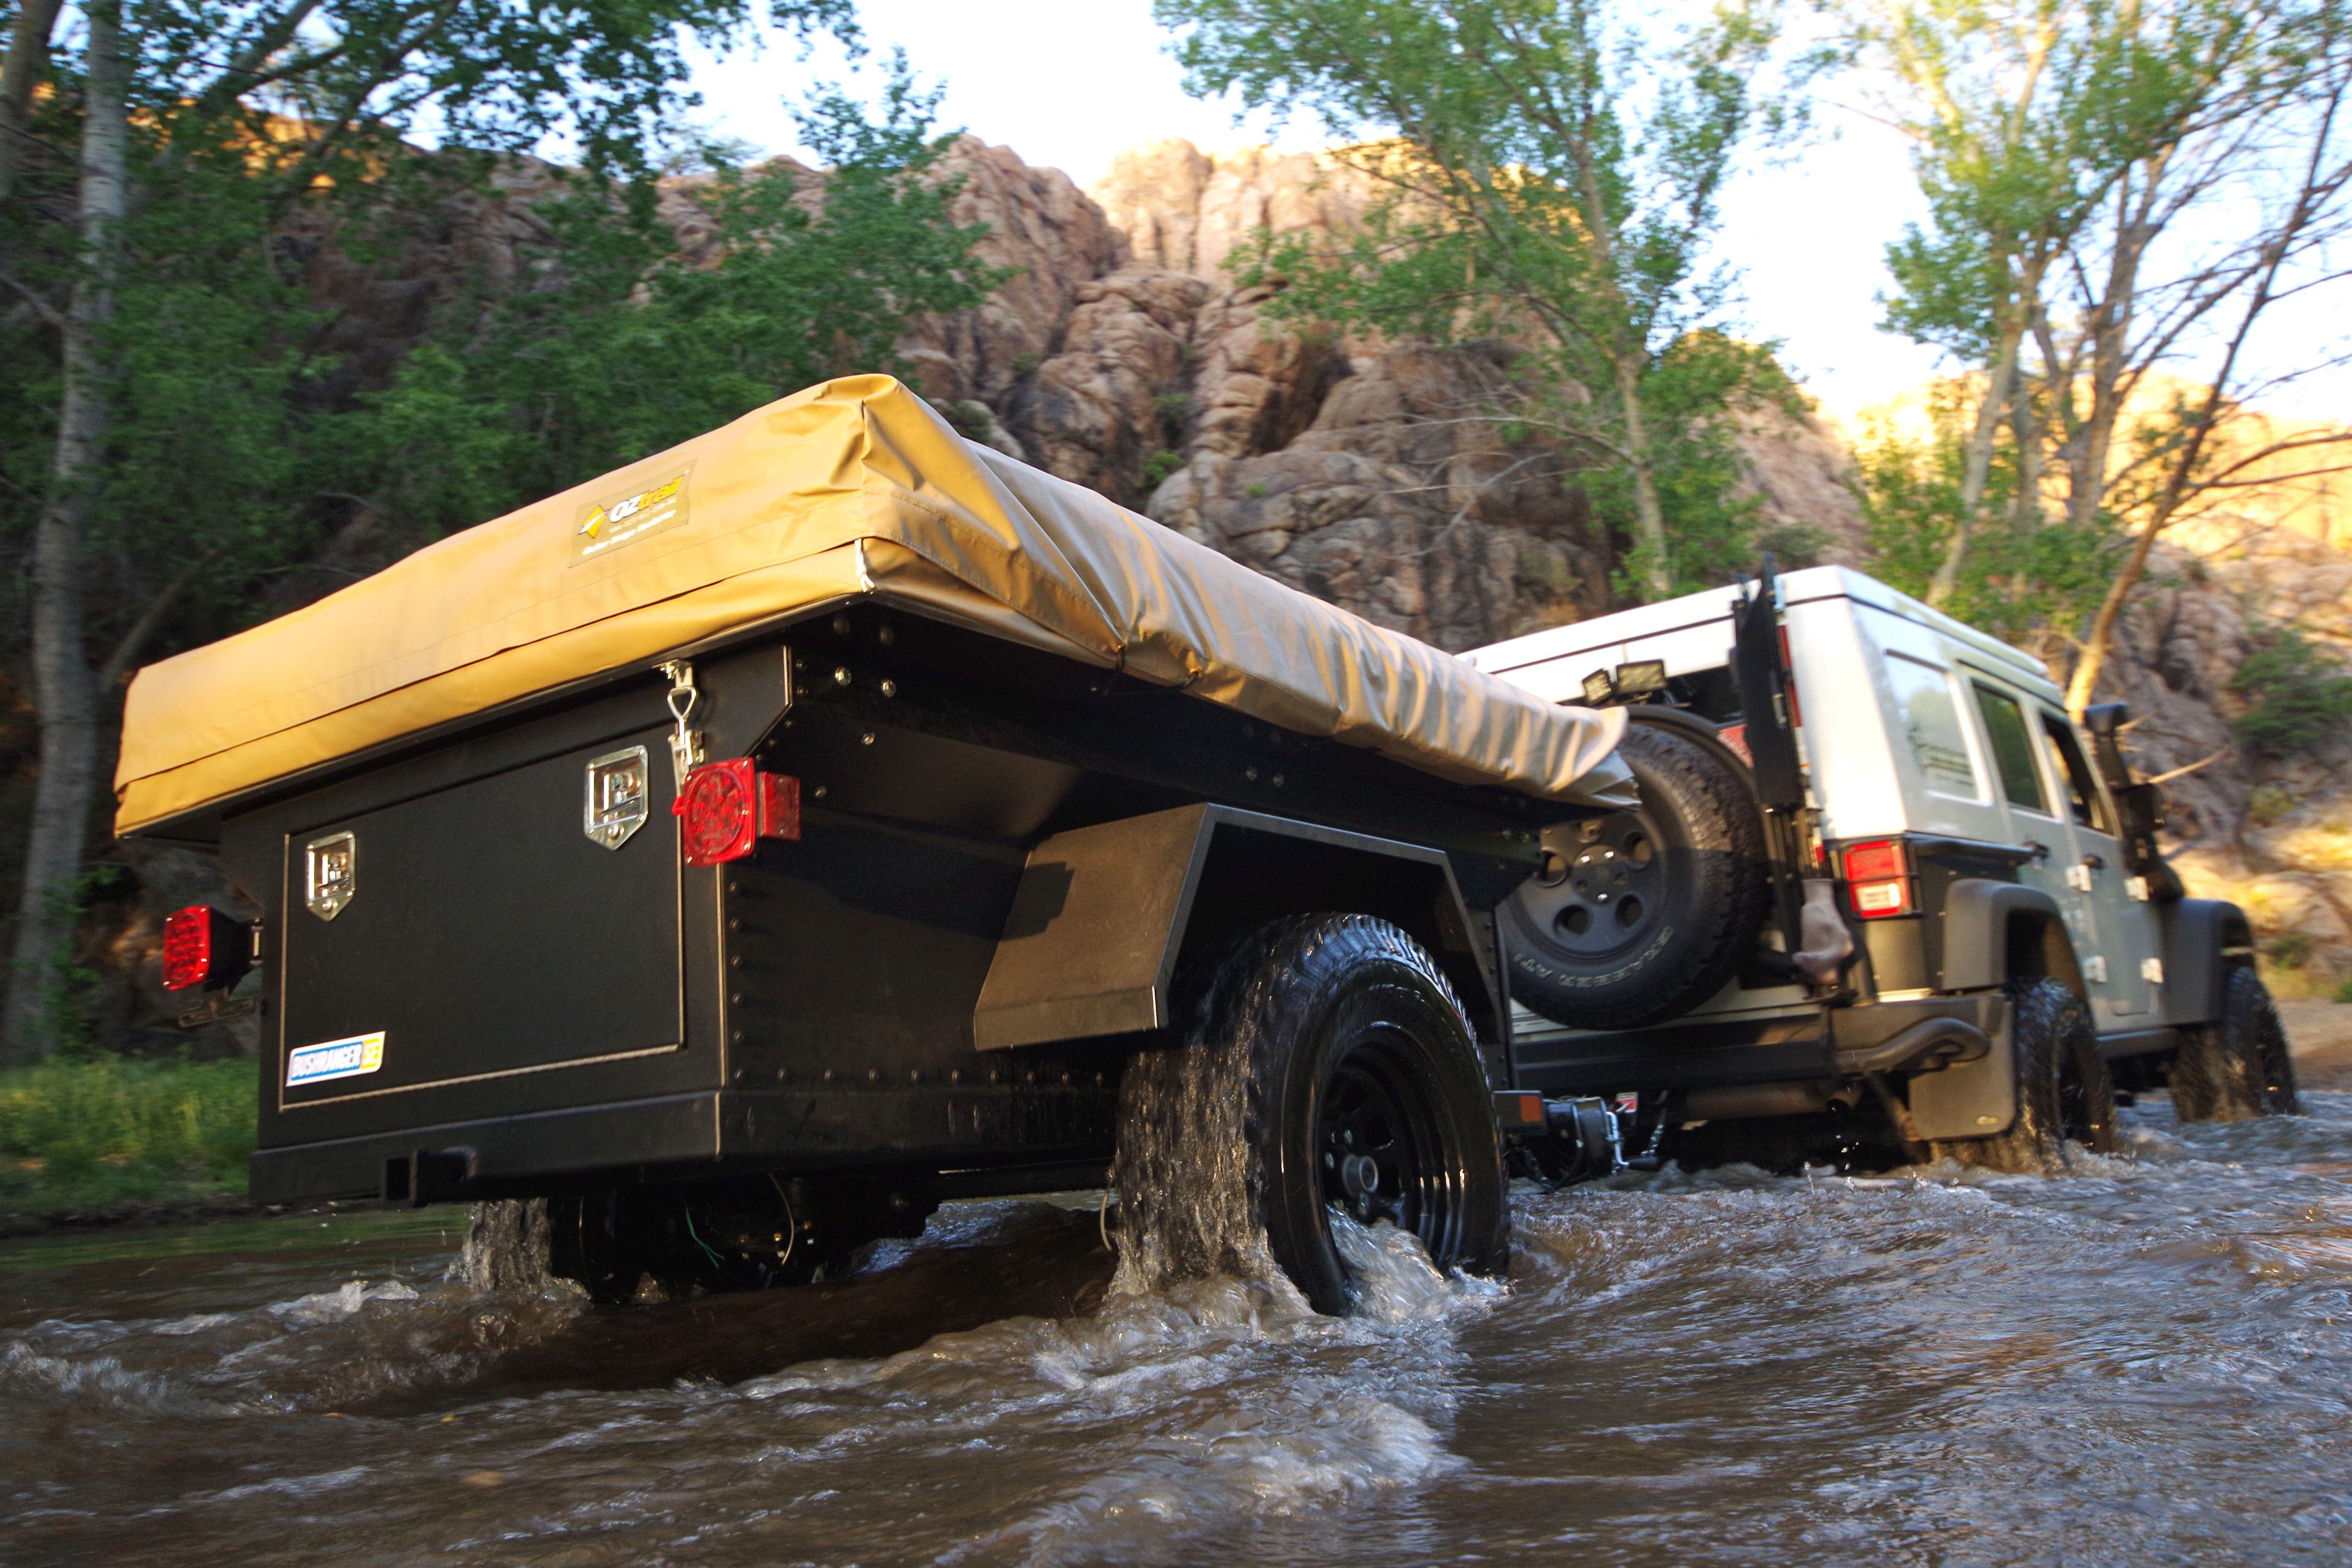 The Bushranger overland trailer built by Kakadu Camping